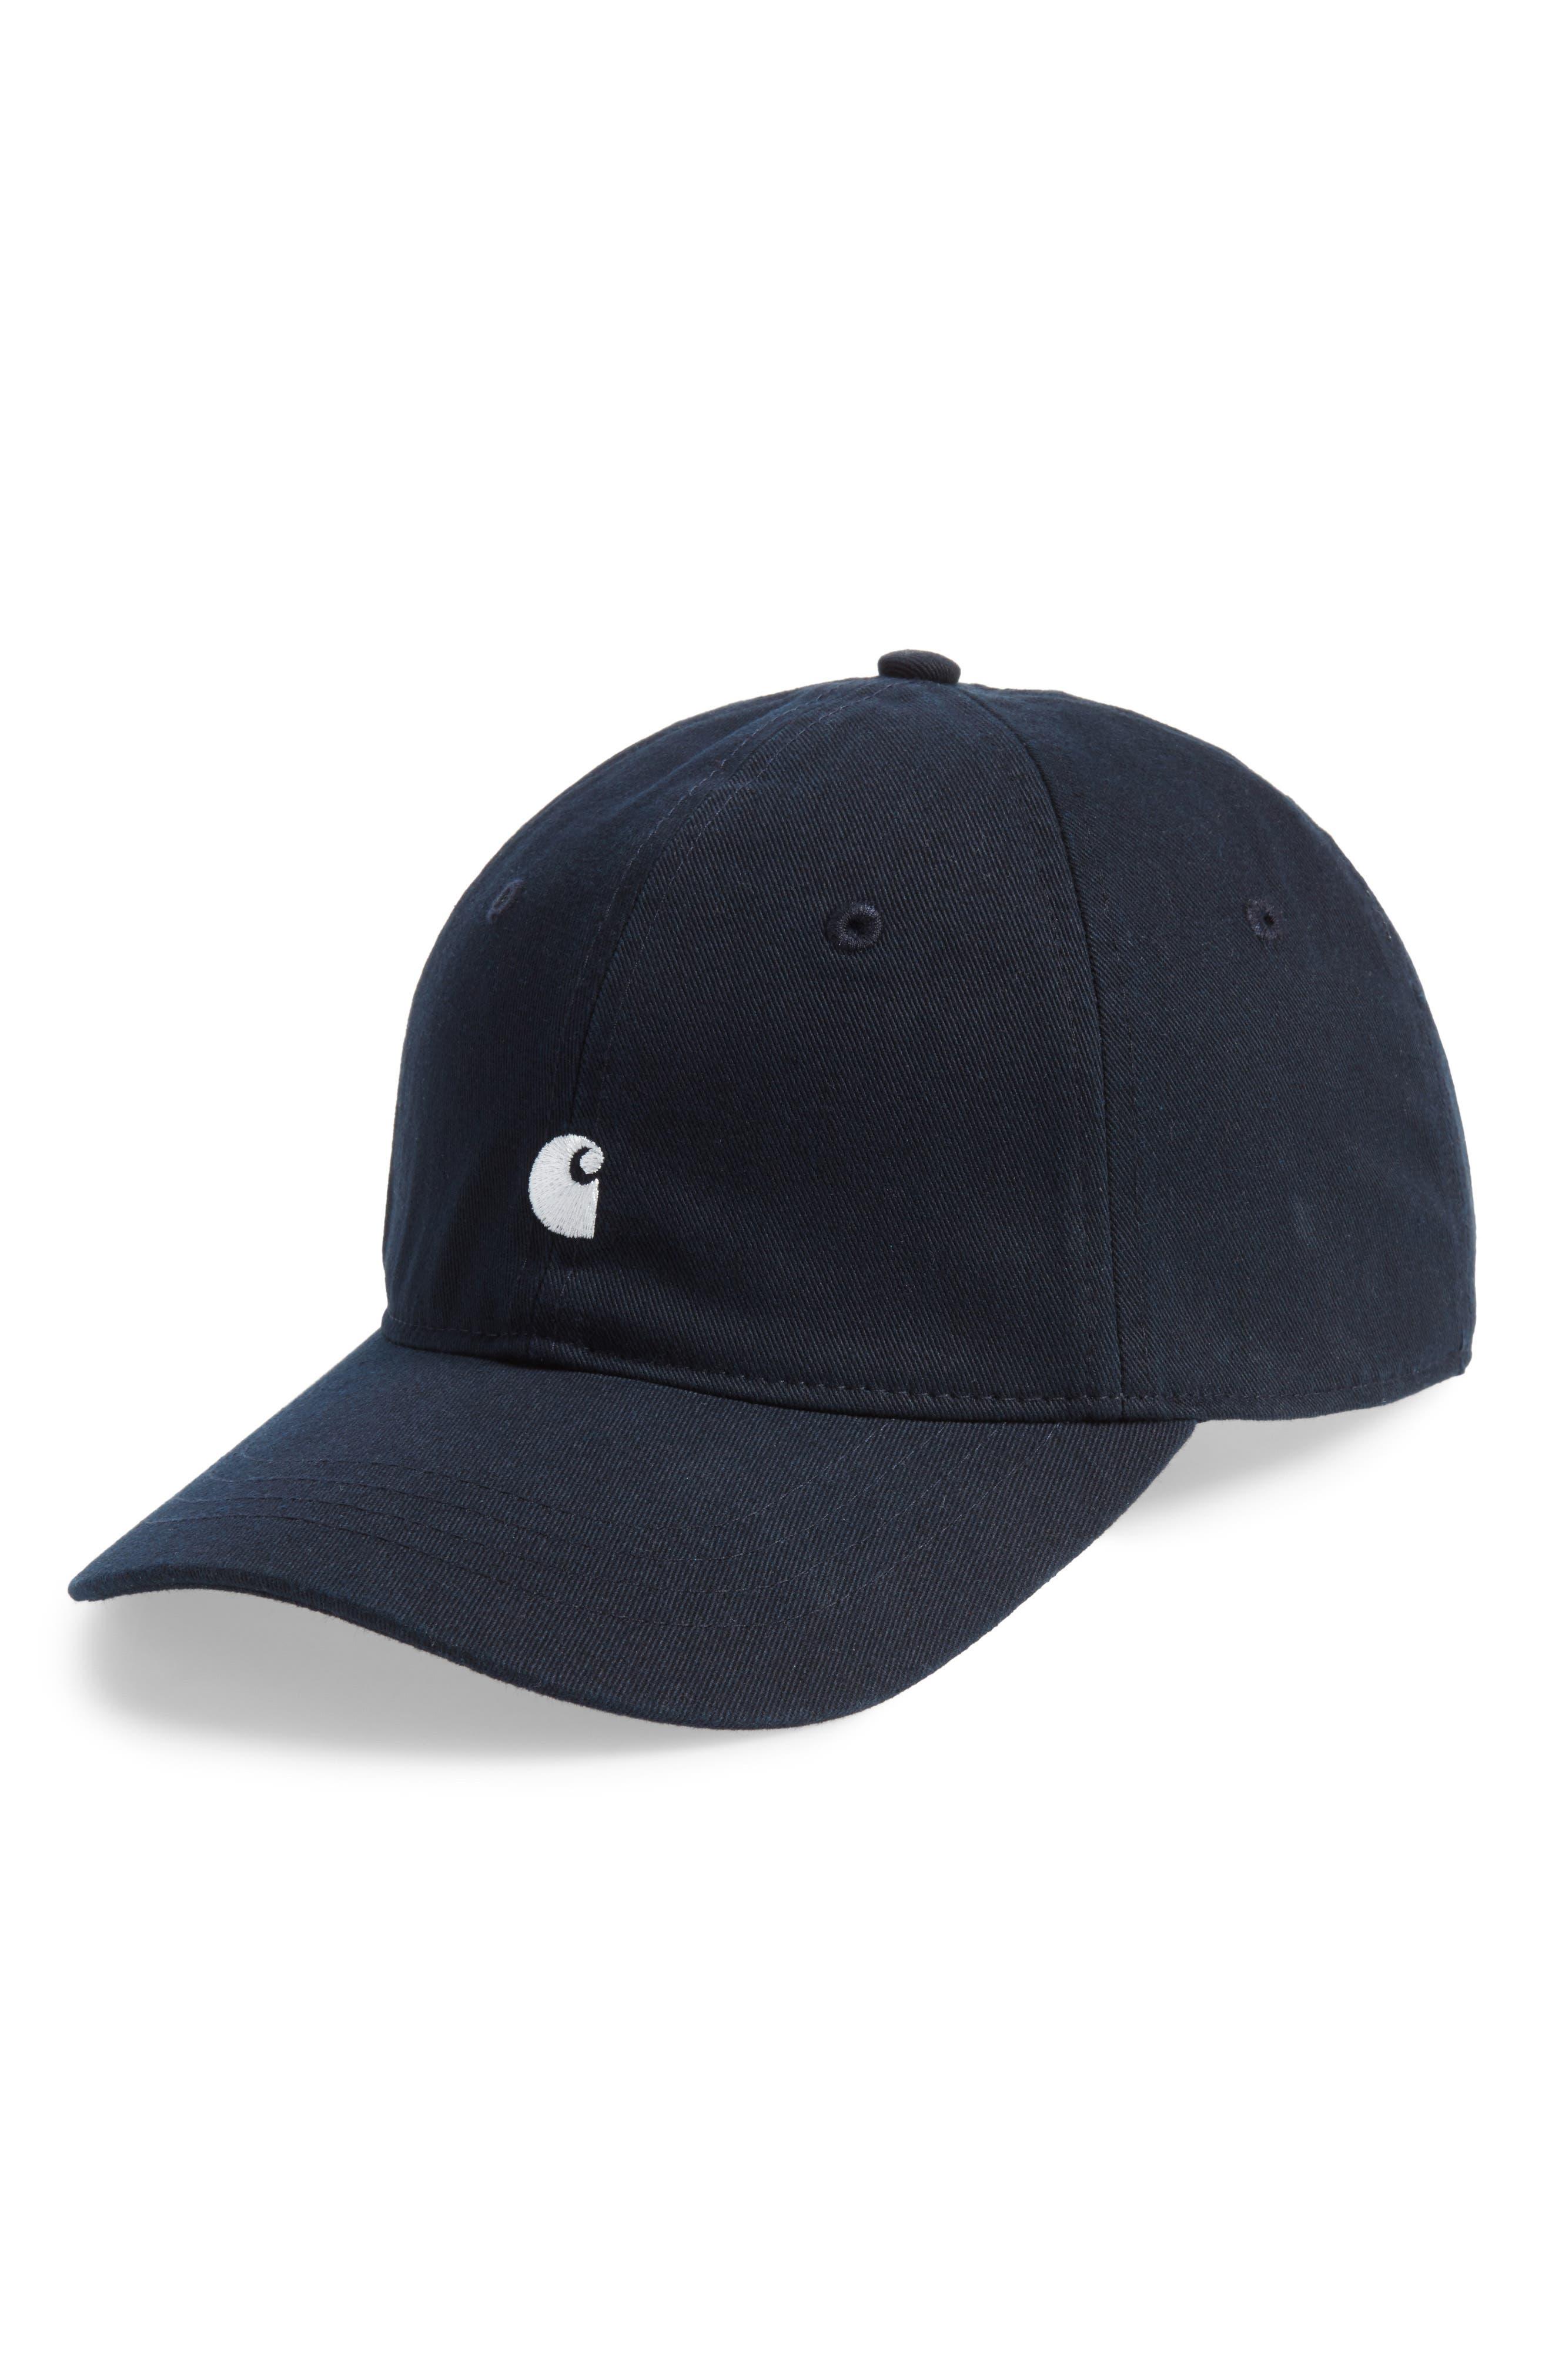 Madison Baseball Cap,                             Main thumbnail 1, color,                             1C00-Dark Navy/Black